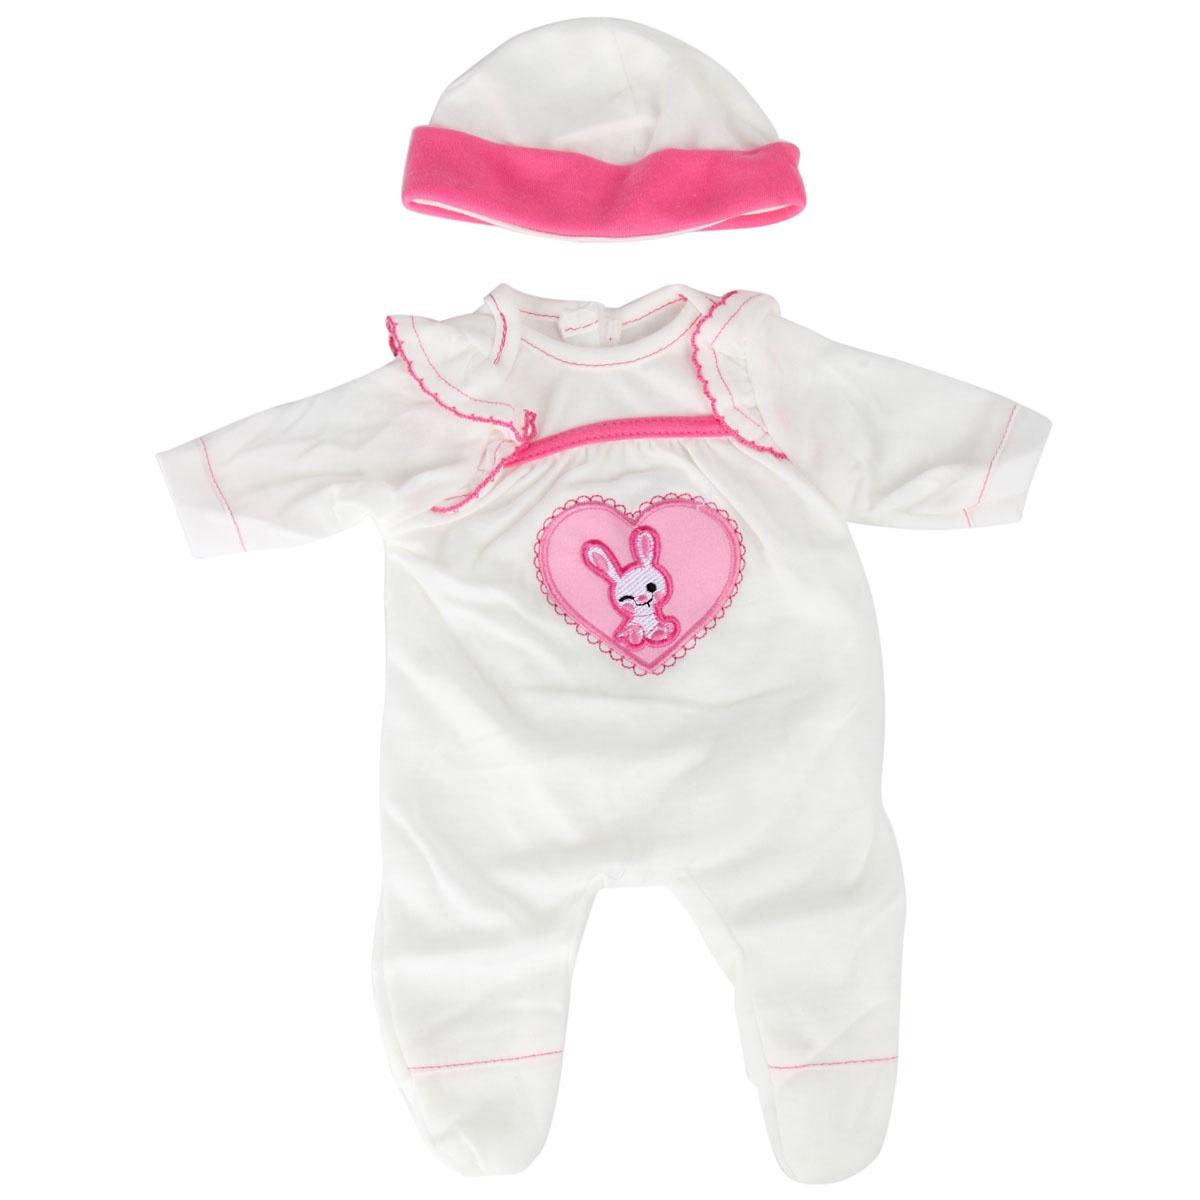 куклы и одежда для кукол asi одежда для кукол 60 см 0000092 Одежда для кукол Veld Co 75903